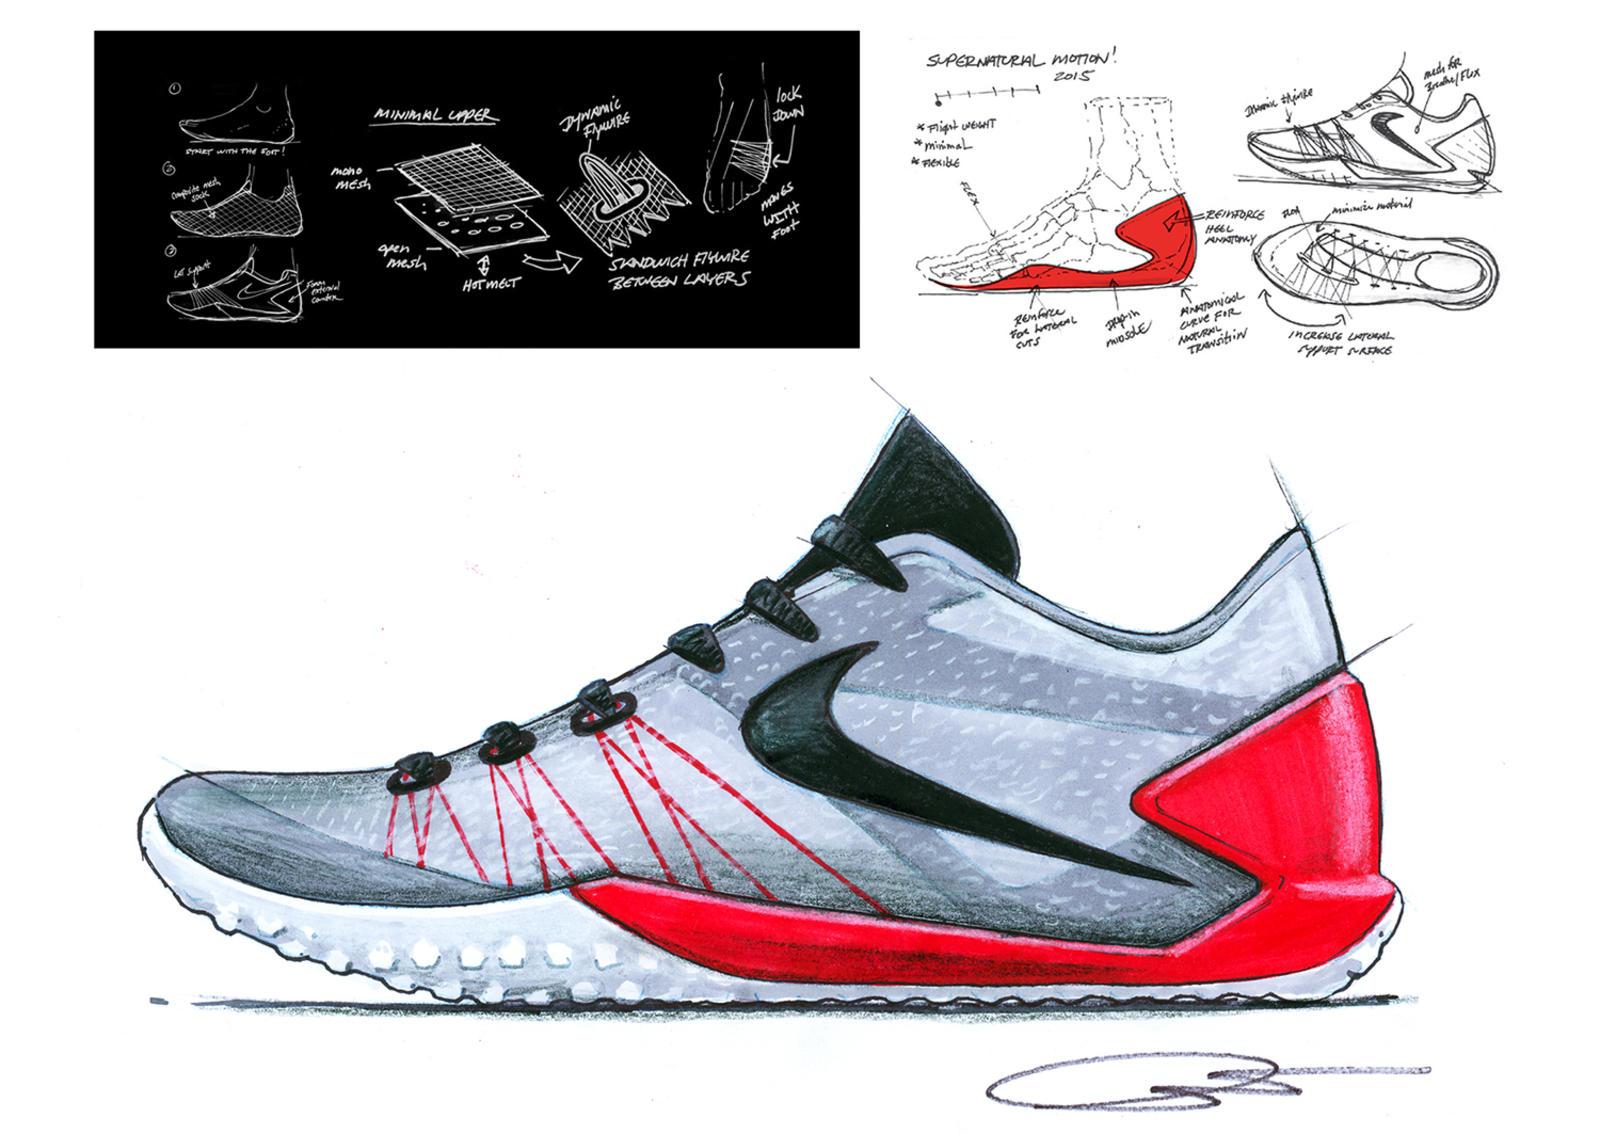 nike shox leapers avis - Nike News - Introducing the Nike Hyperchase Basketball Shoe for ...